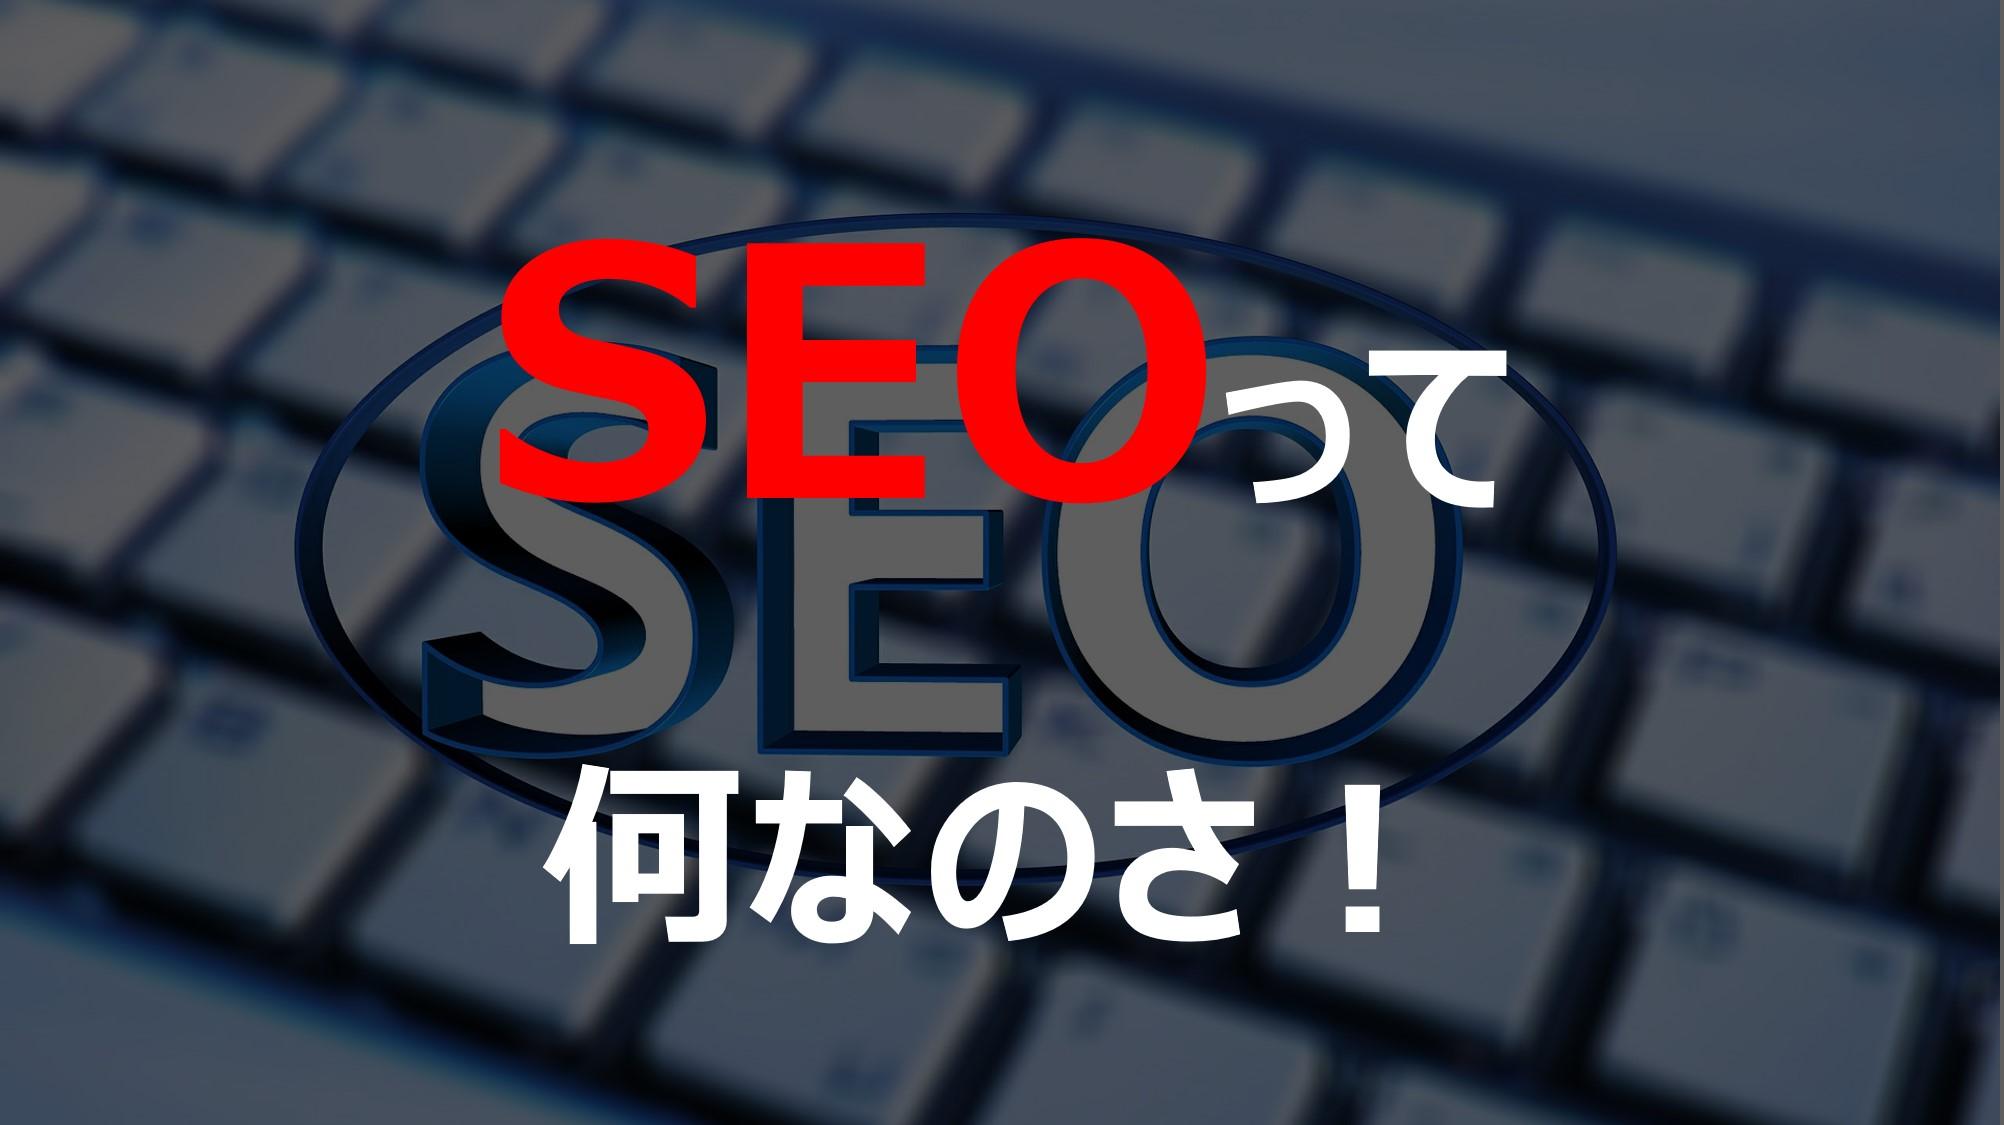 SEO(検索エンジン最適化)の基礎!SEOとは何?なぜSEOが必要なのか?